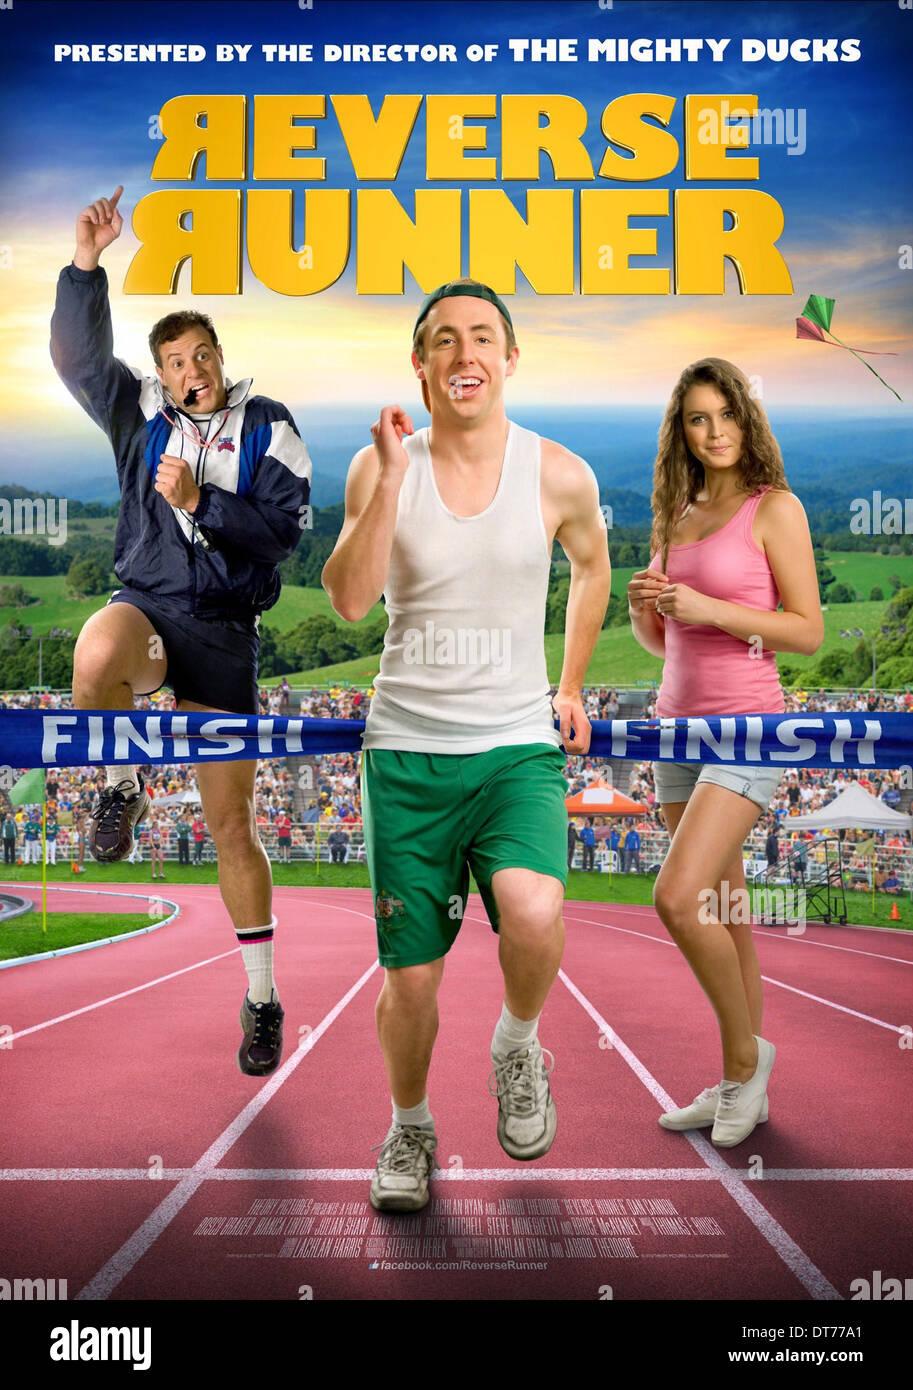 DAN CANNON & BIANCA LINTON REVERSE RUNNER (2012) - Stock Image